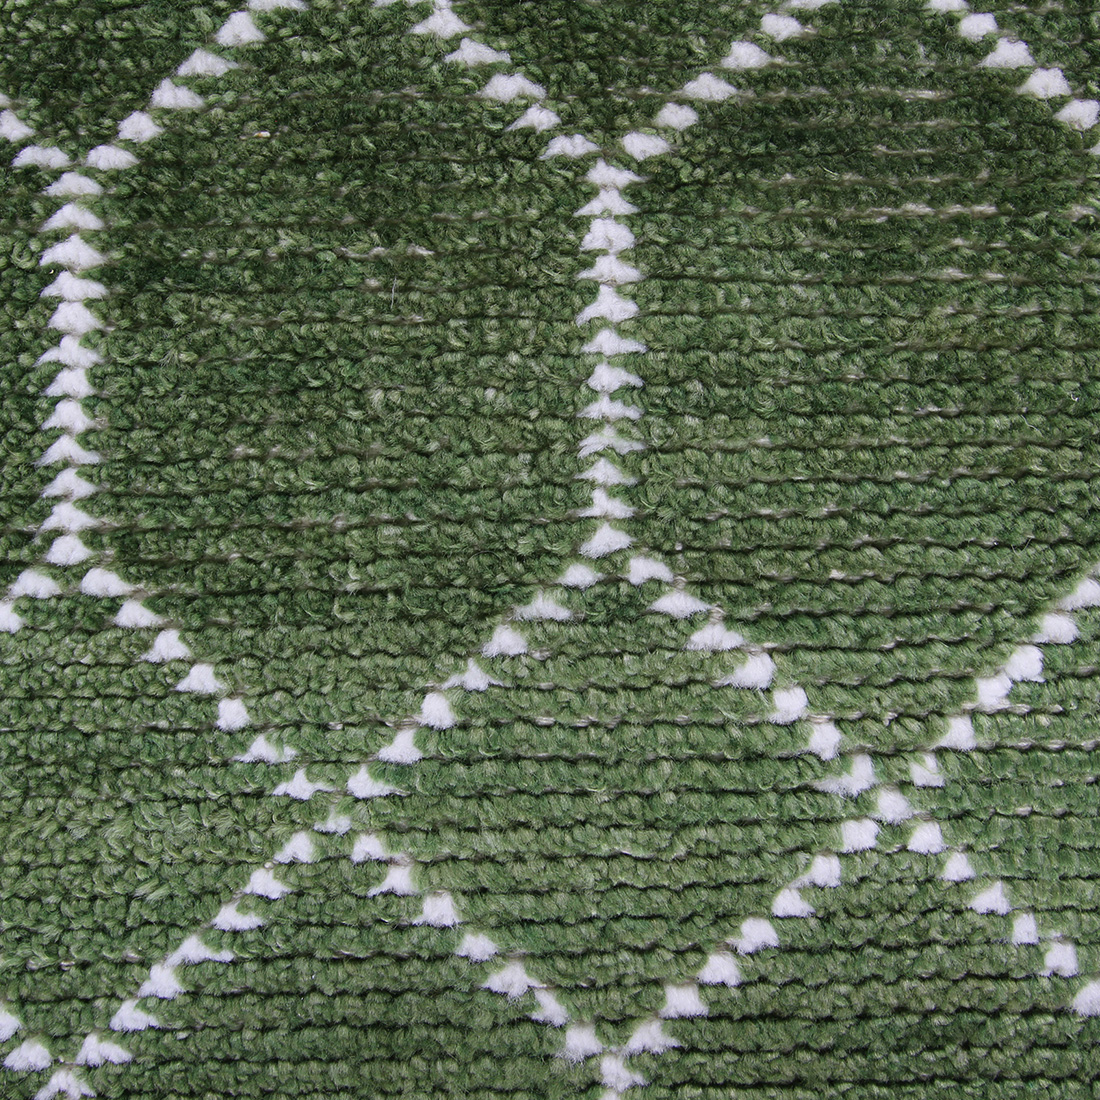 Vloerkleed Brinker Laatz Army Green | 170 x 230 cm